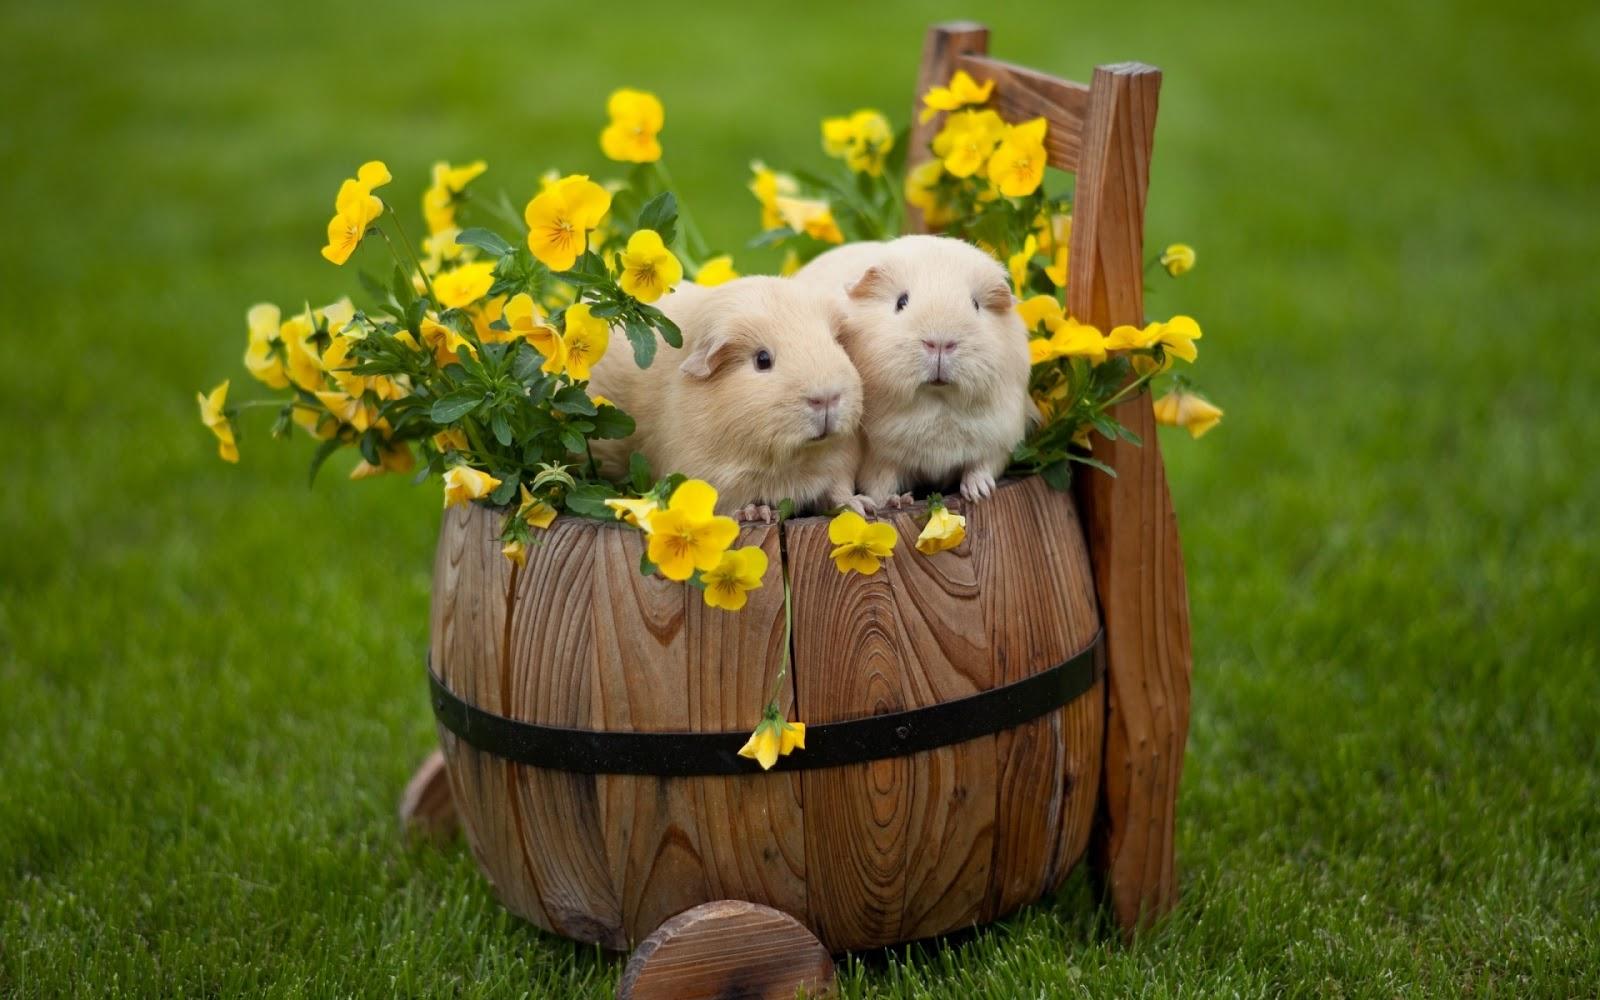 http://2.bp.blogspot.com/-4nn5FjVc8dM/UTA0jbuhaPI/AAAAAAABr8M/FBjyzb_Vl-g/s1600/happy-easter-rabbits-1920x1200-wallpaper-.jpg